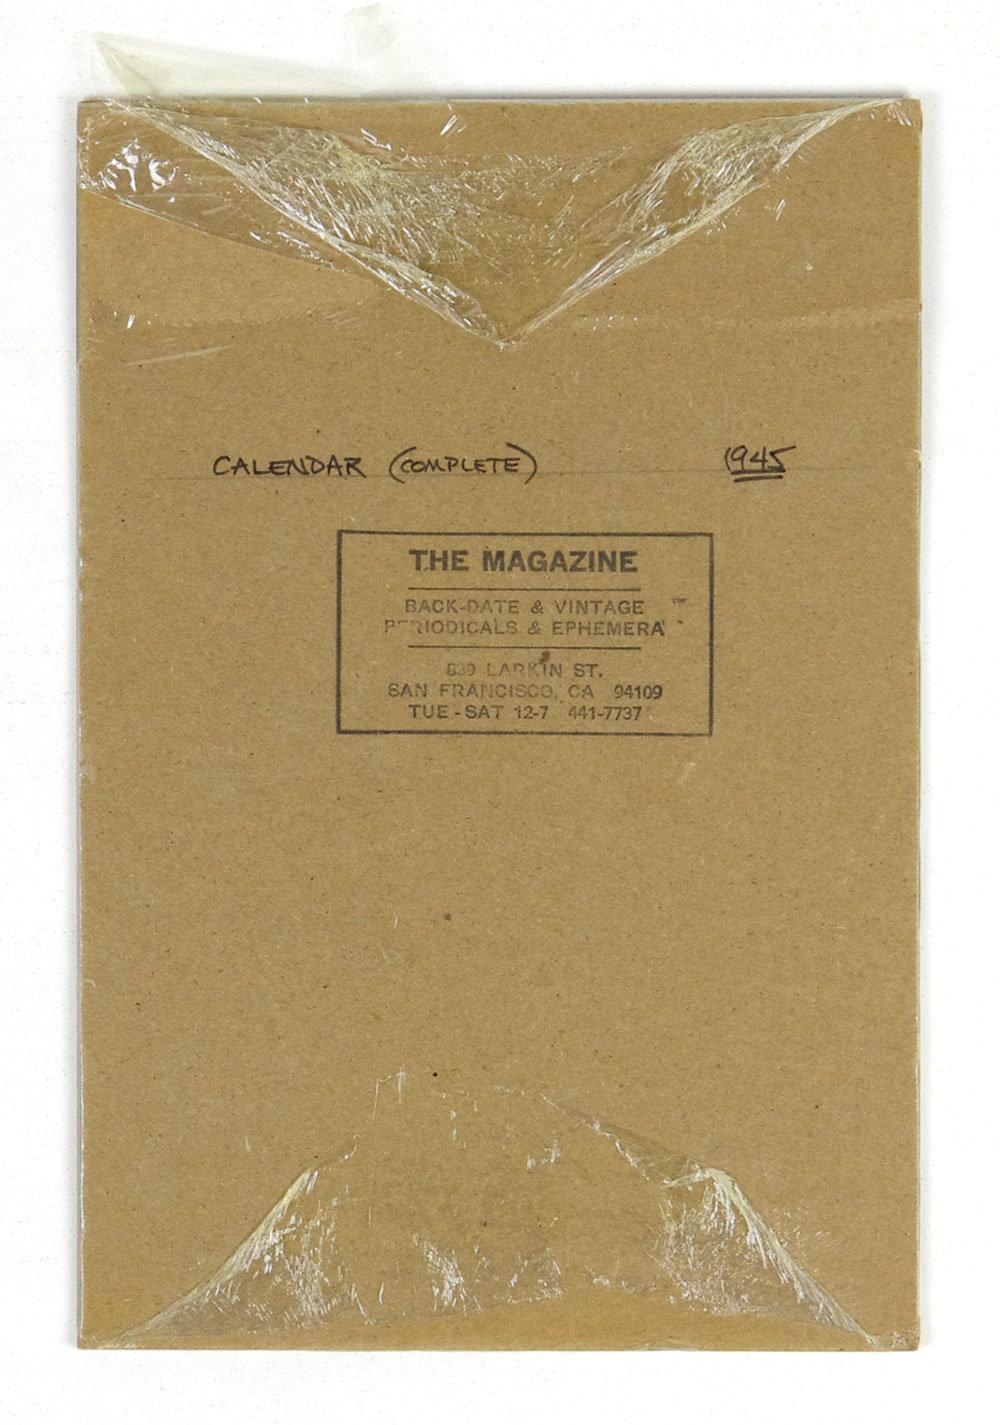 Cecelia Margret Meagher Coronet Magazine Cover Girl 1945 Vintage Calendar